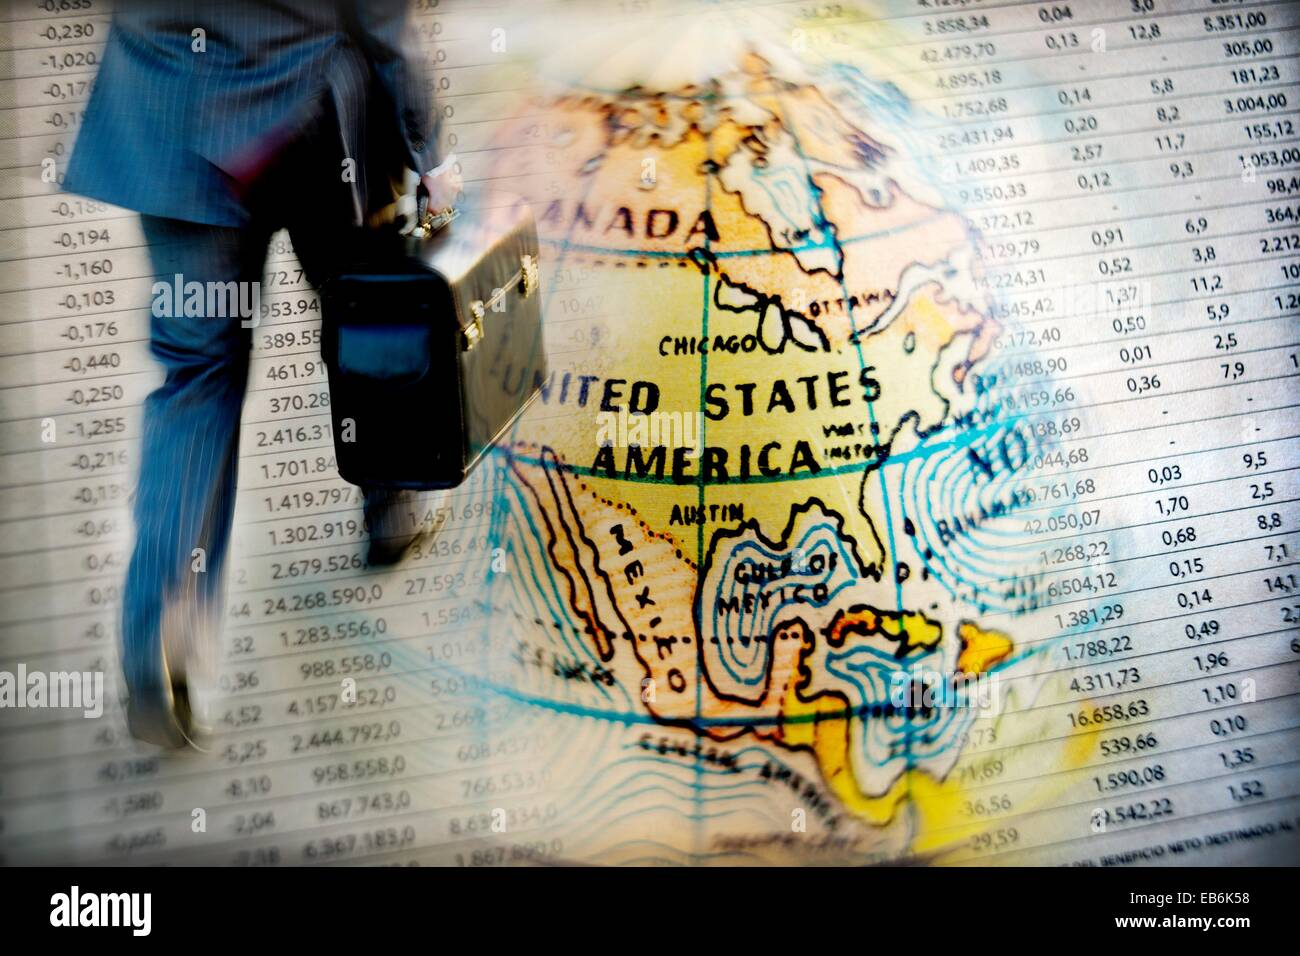 hombres de negocios corriendo sobre mapa de estados unidos e informacion de mercado de valores composicion digital - Stock Image